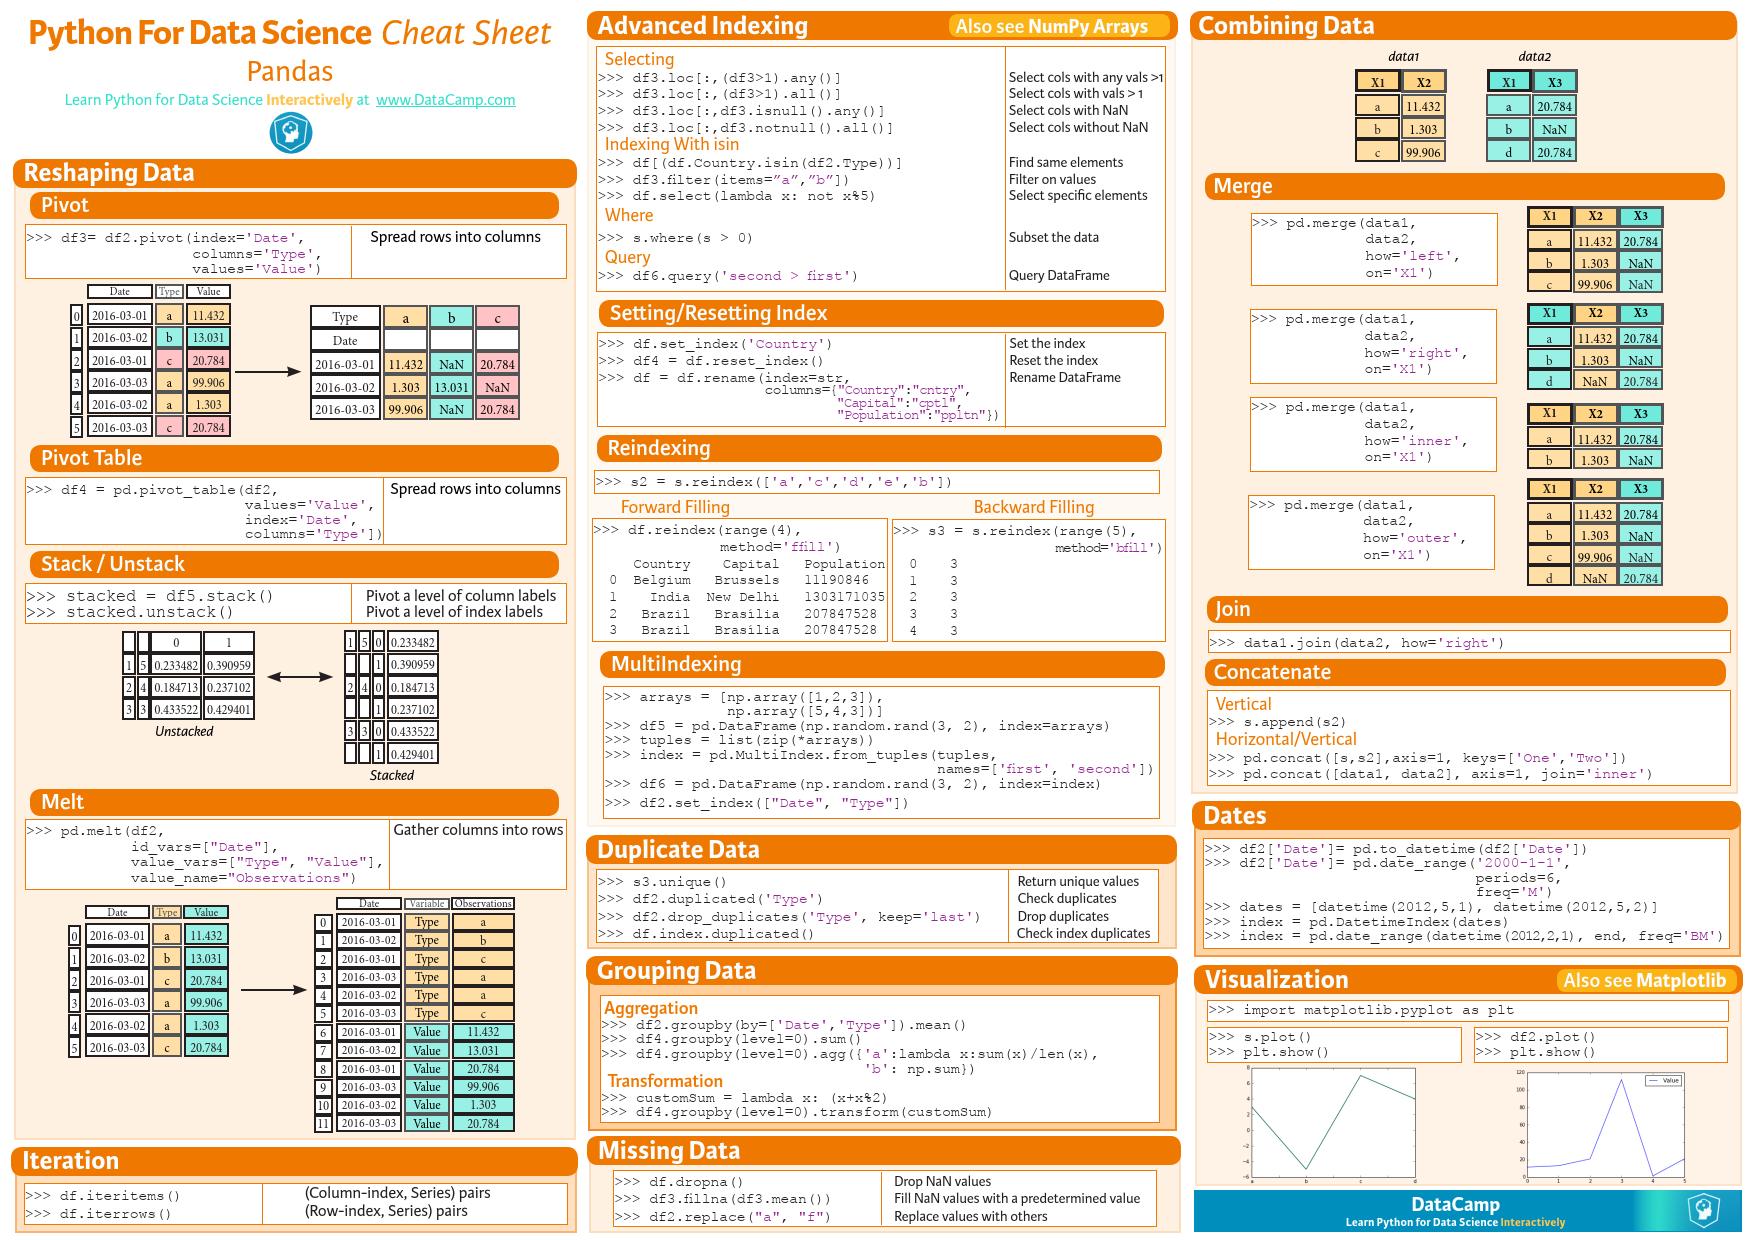 Pandas - Data Wrangling in Python [Cheat Sheet] | Credit: DataCamp